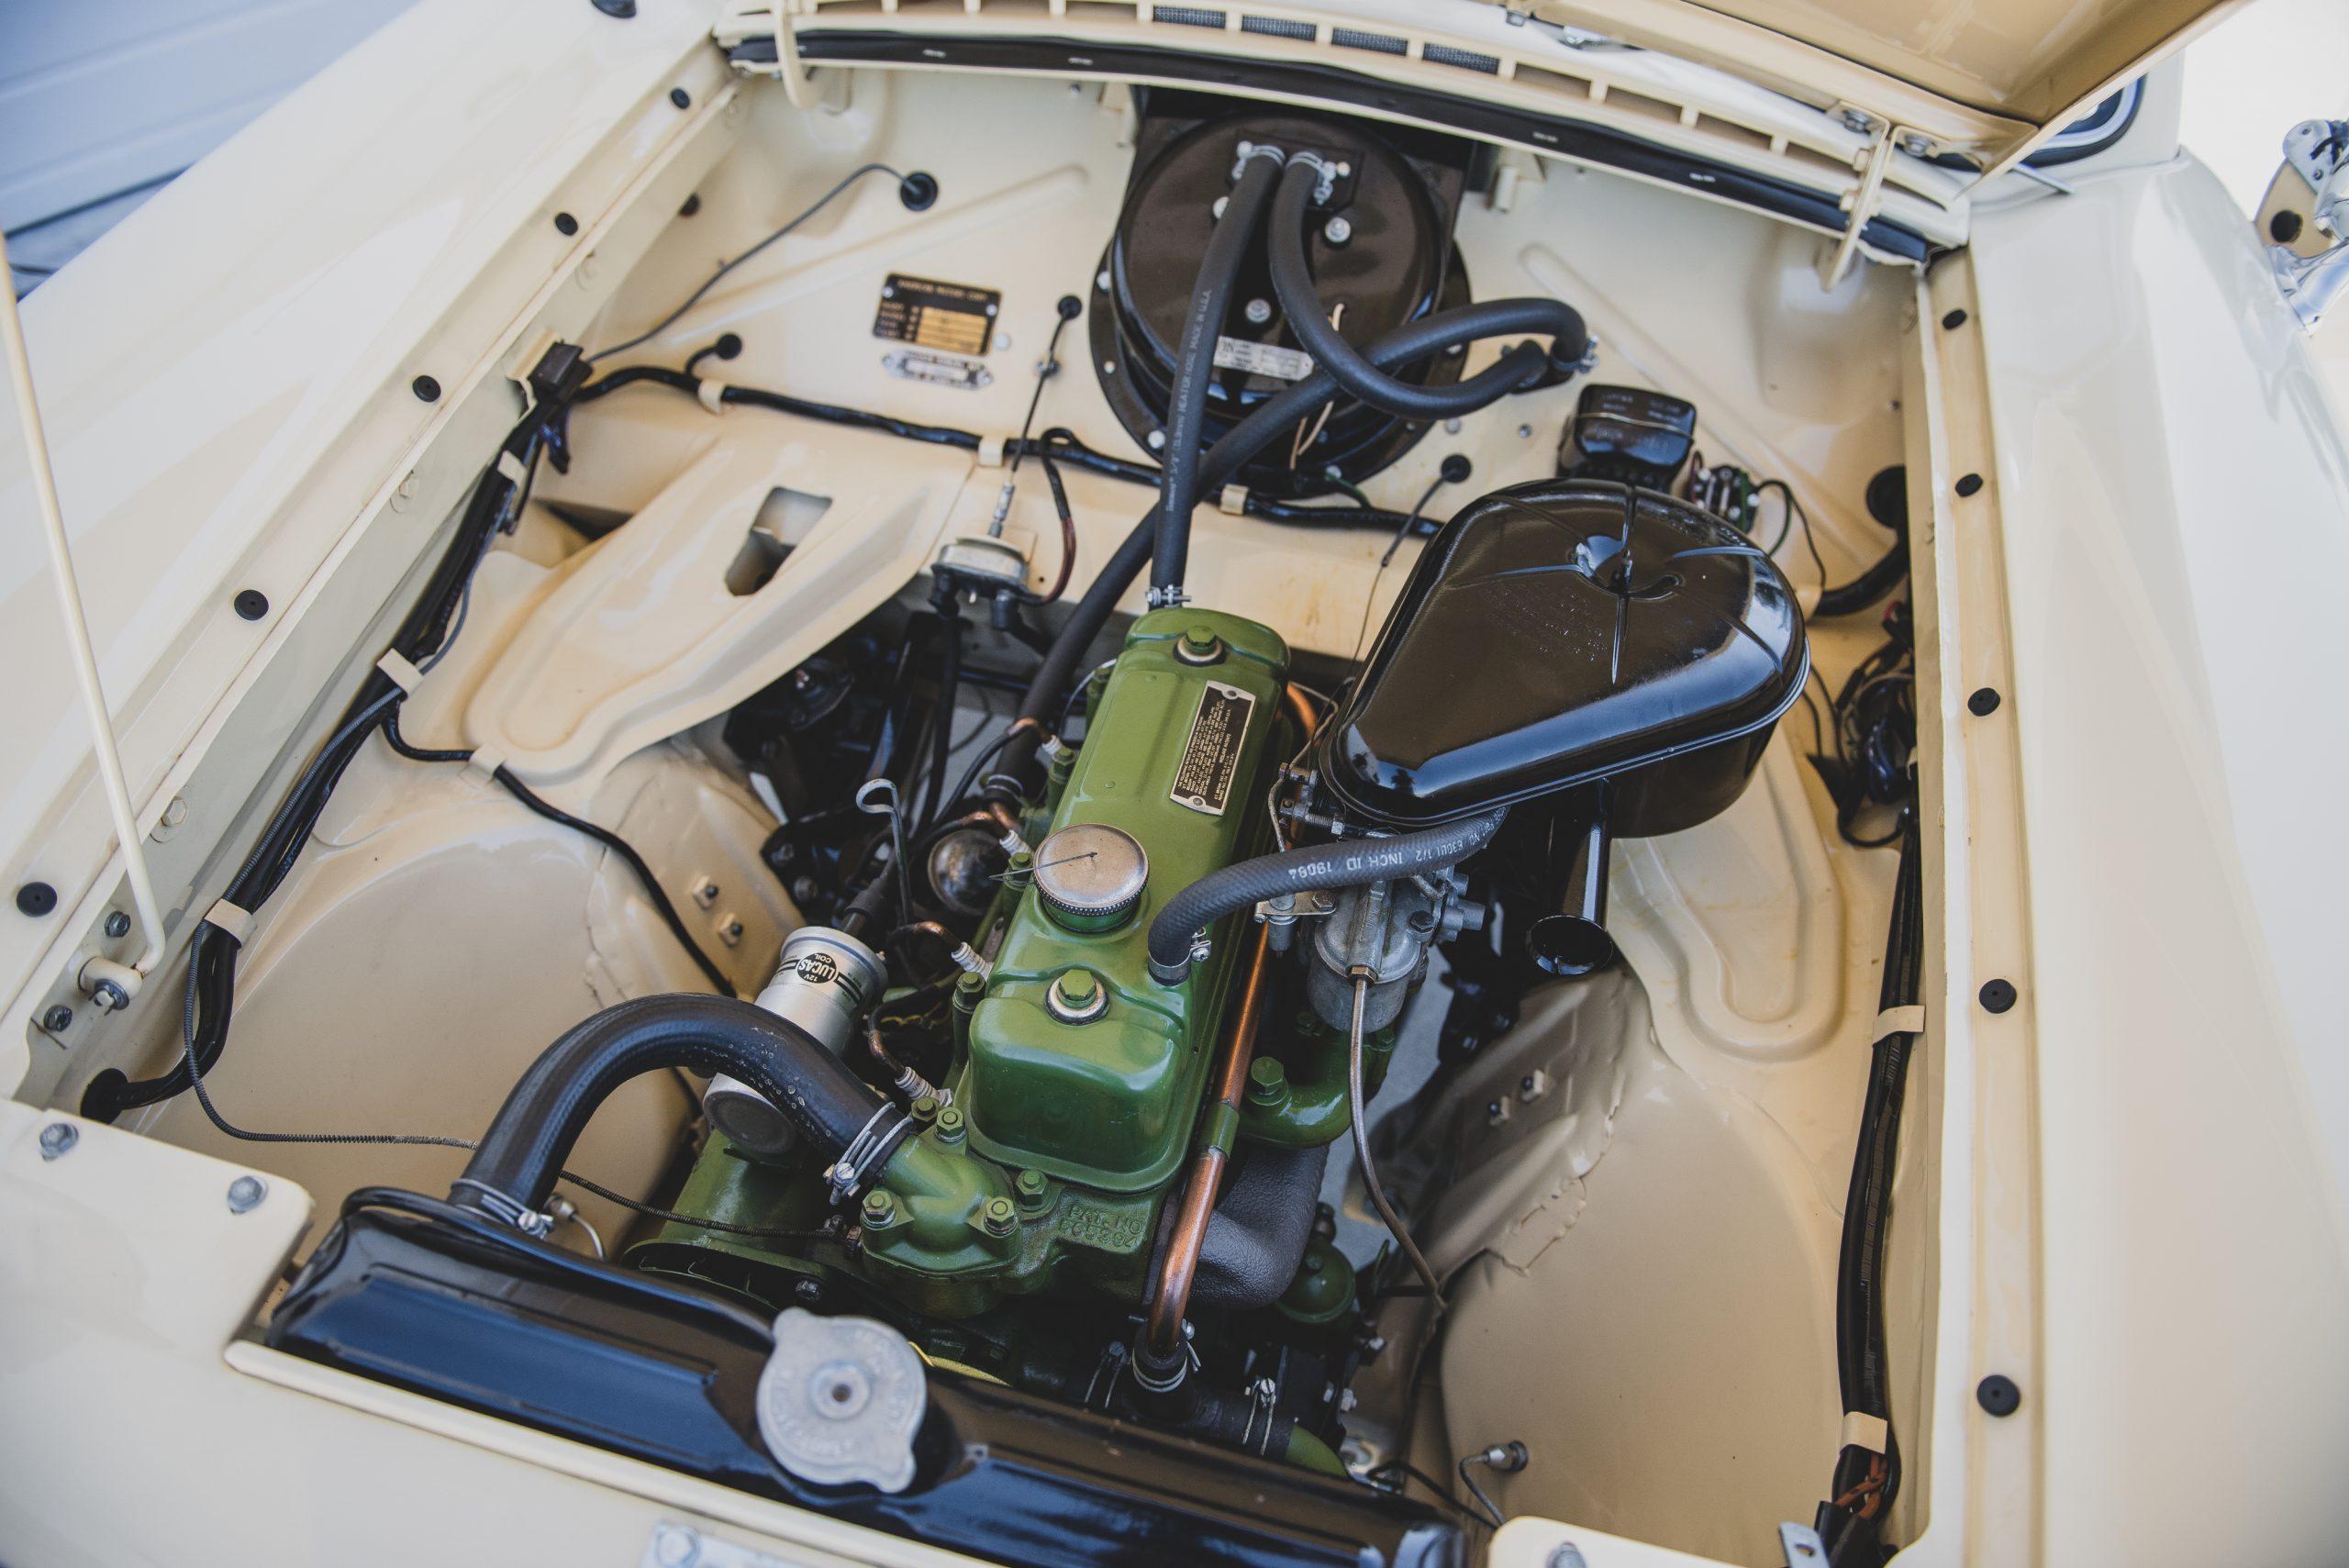 AMC Metropolitan 1500 Convertible engine